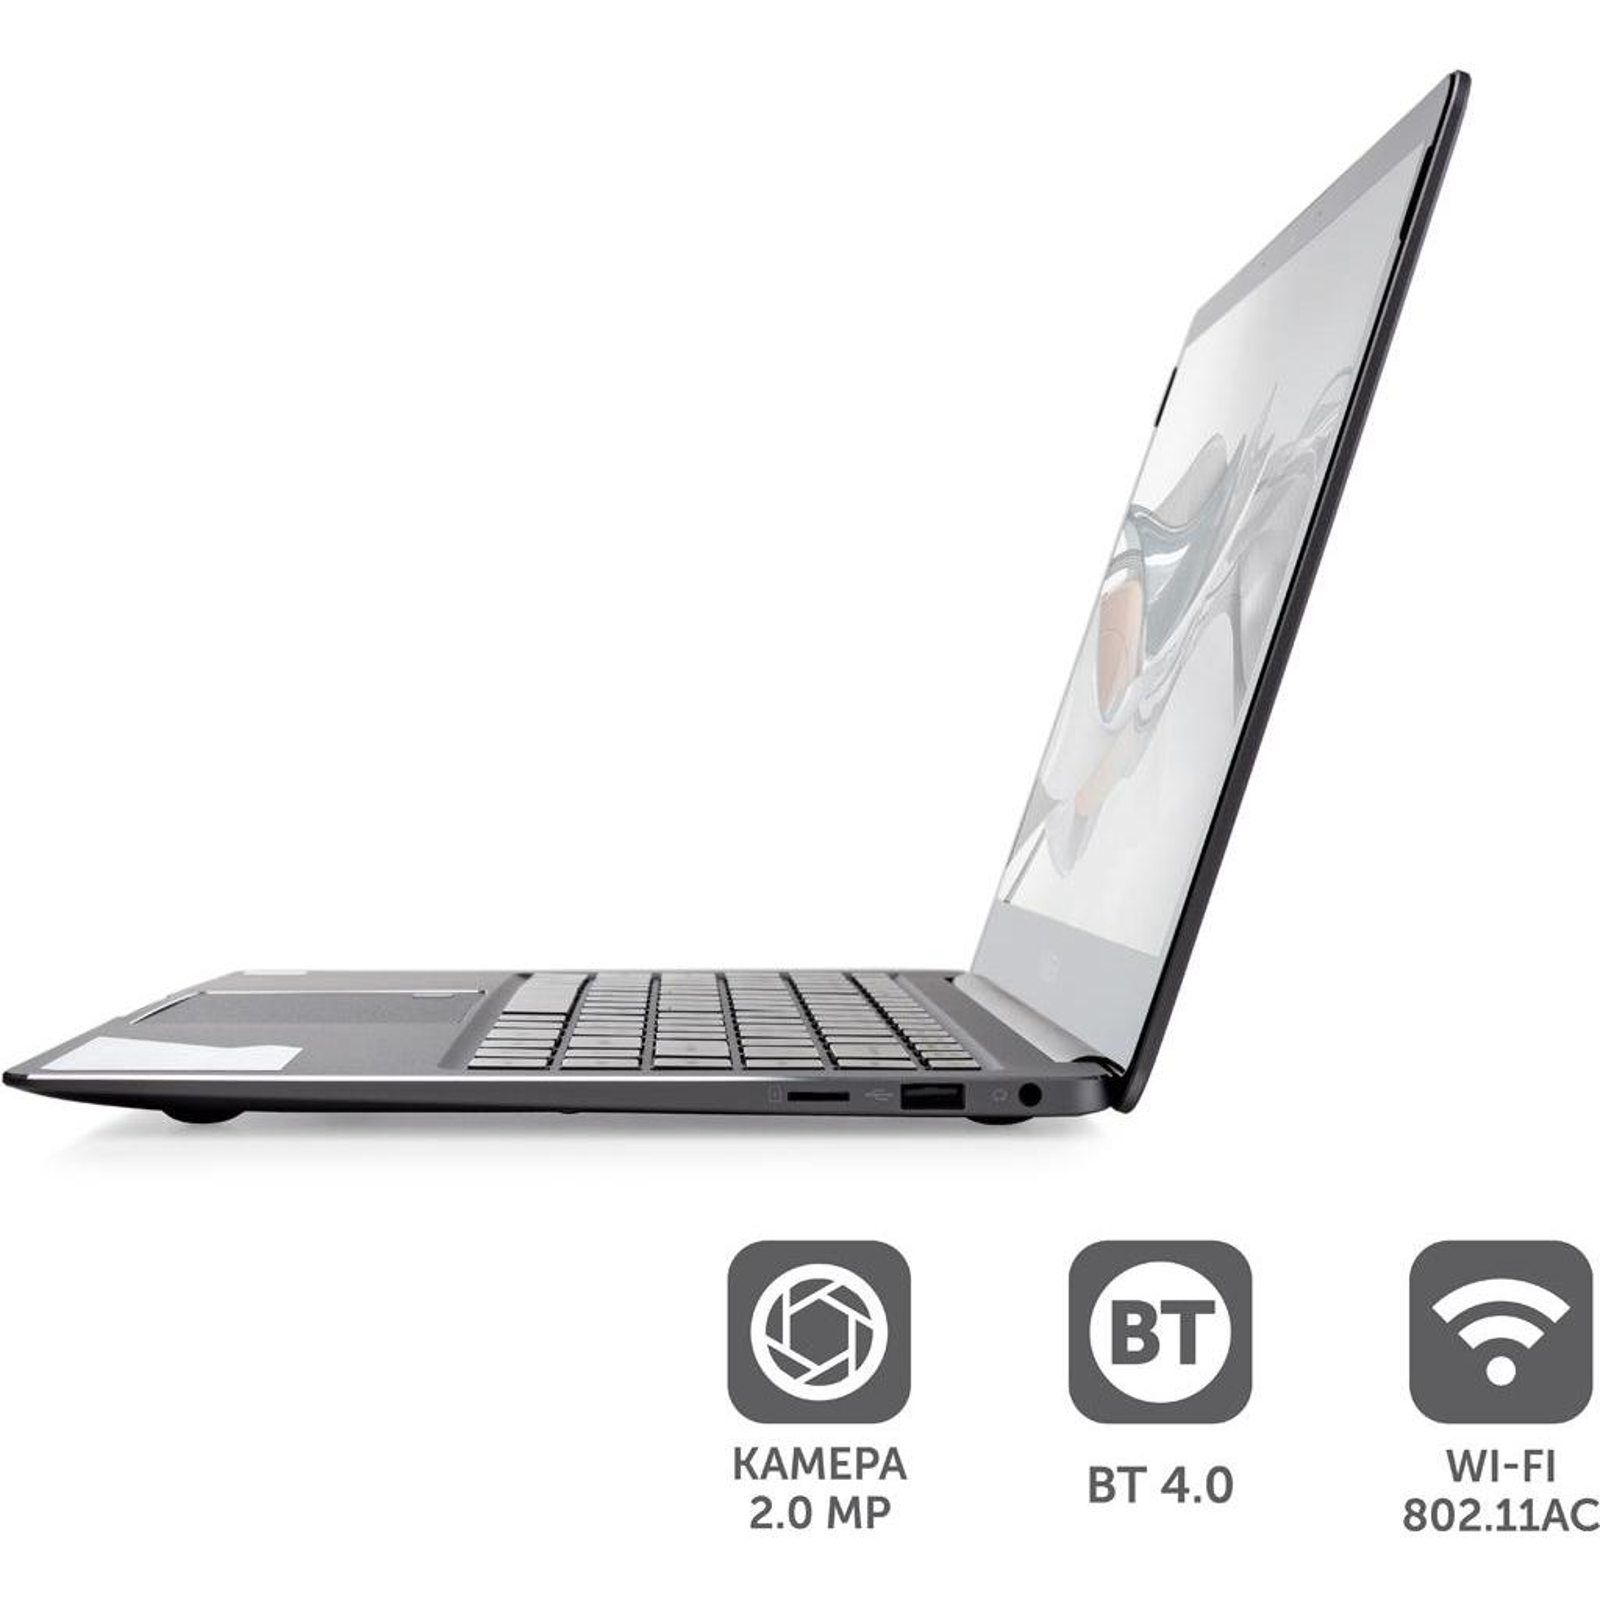 Ноутбук Vinga Iron S140 (S140-P50464GWP) изображение 3